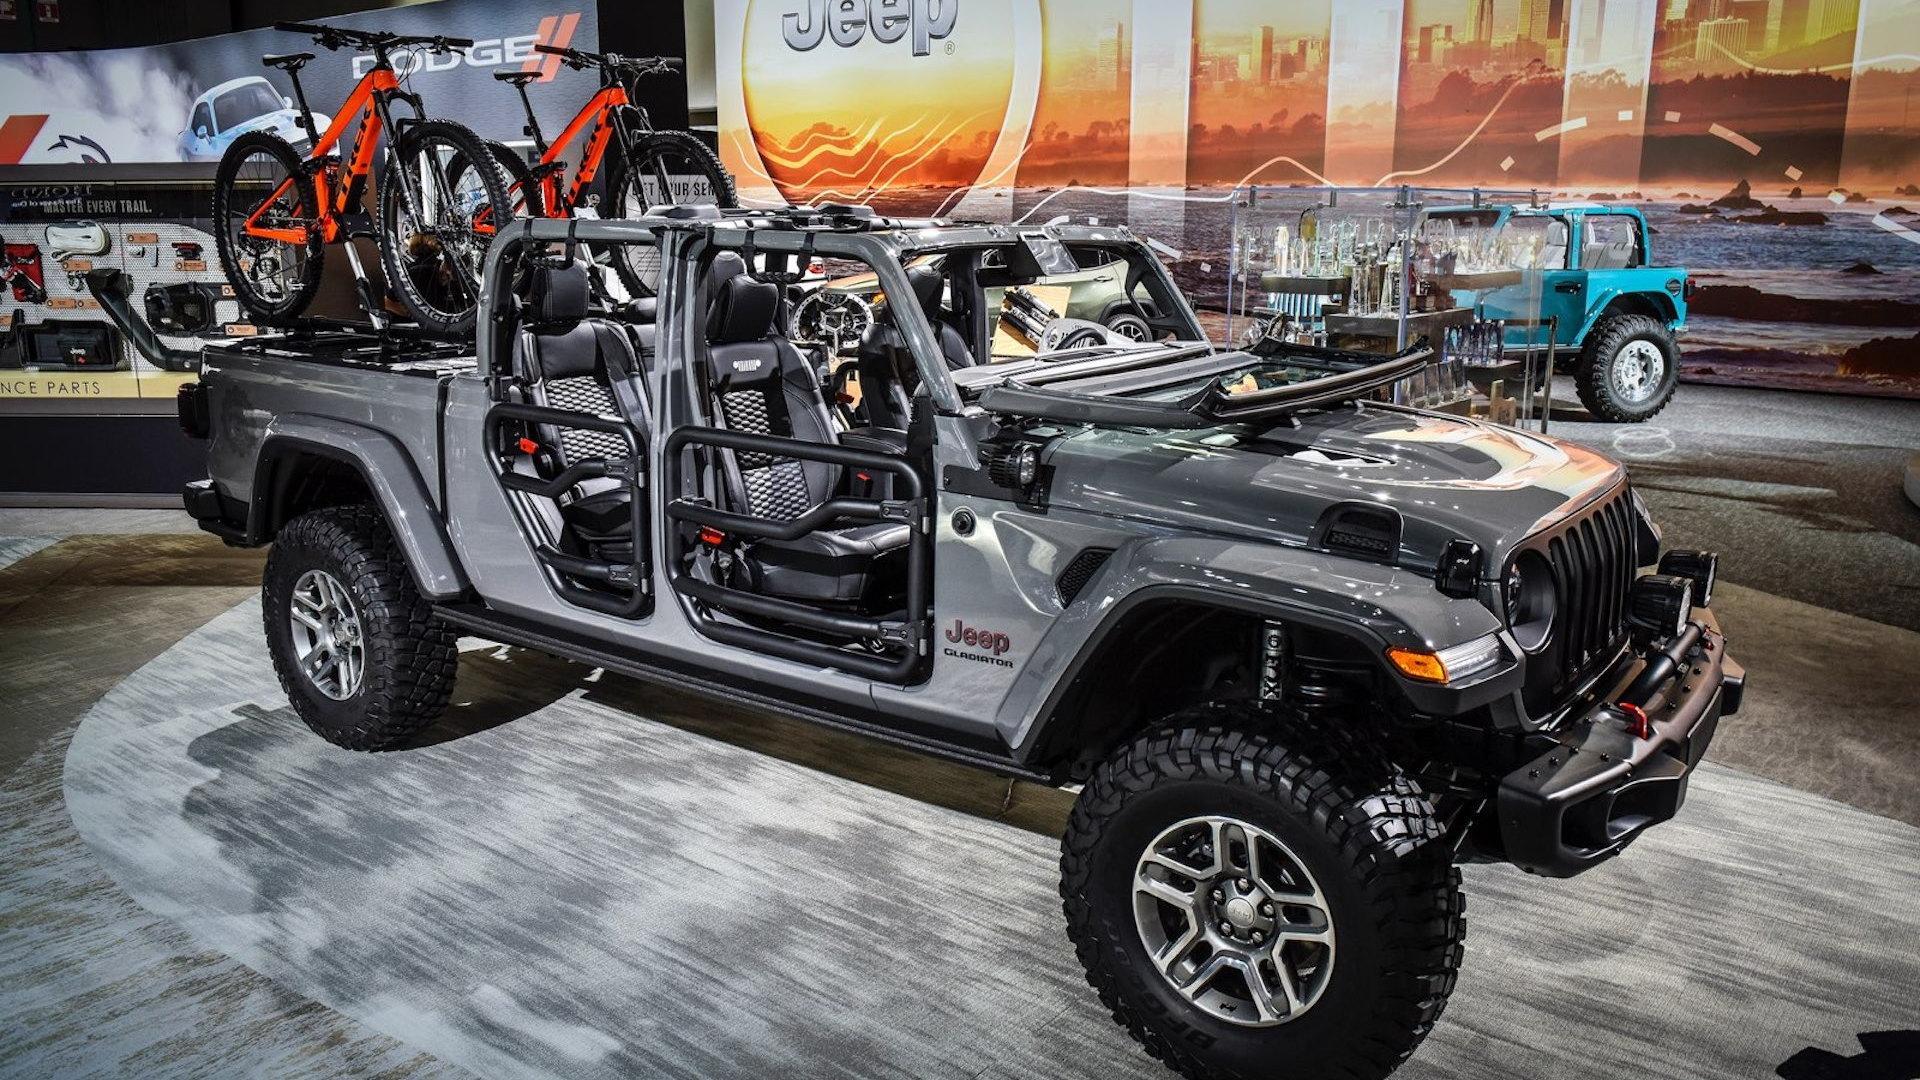 2020 Jeep Gladiator with Mopar accessories